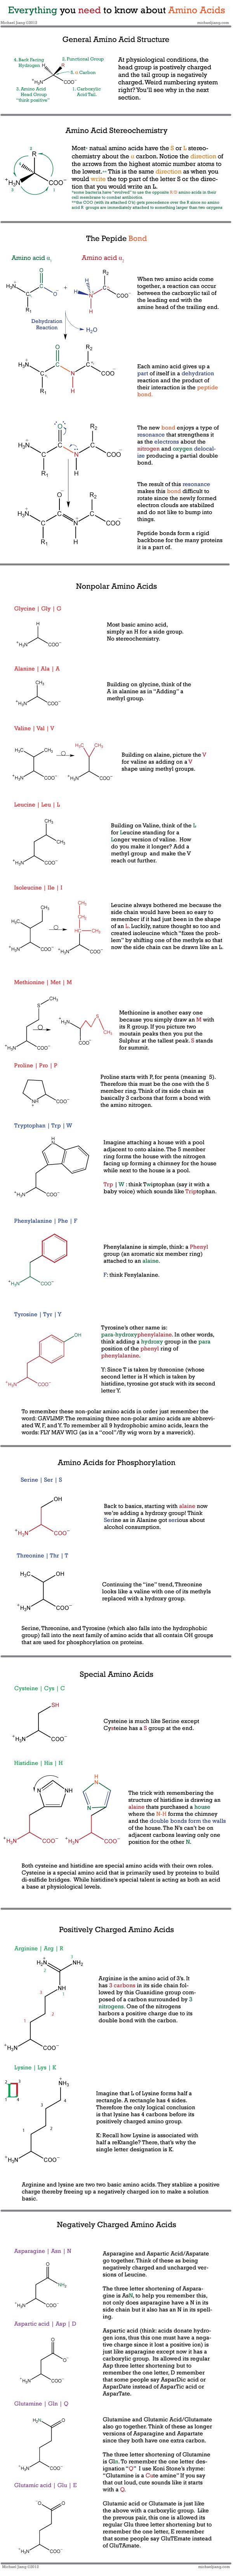 Amino Acids. Biochem grade, you can thank me next semester.